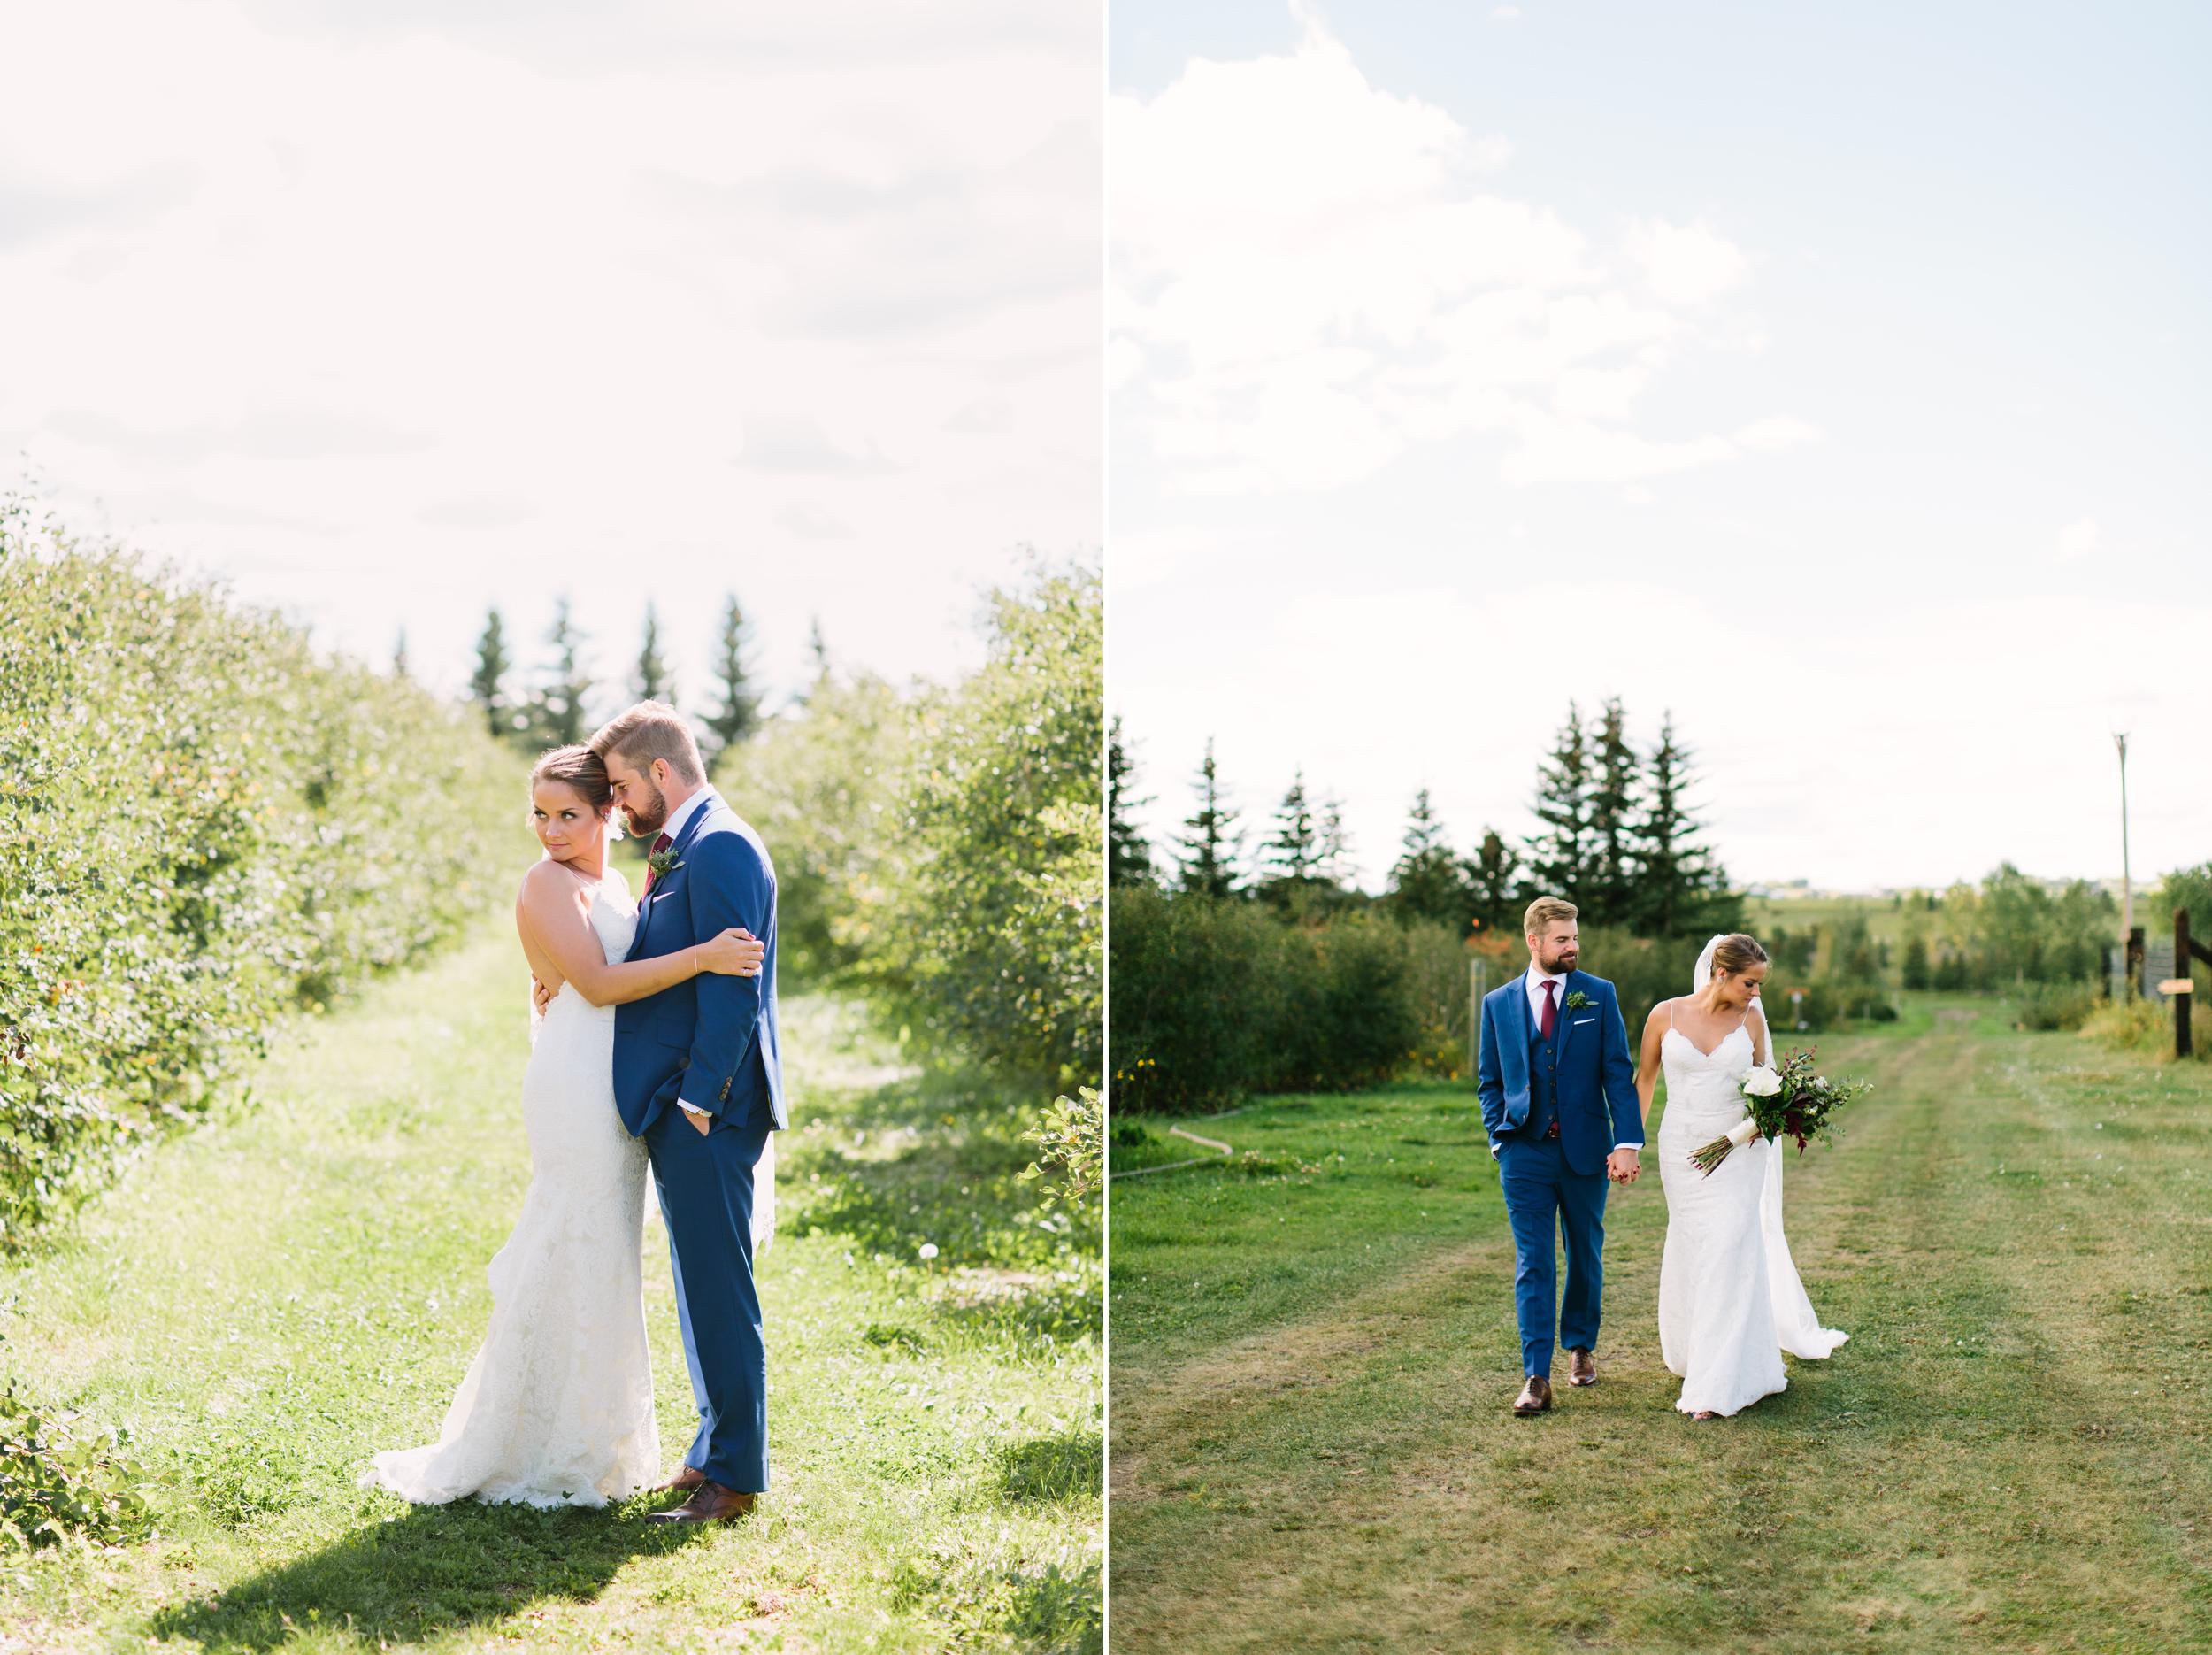 Saskatoon_Farm_Greenhouse_Wedding0026.jpg